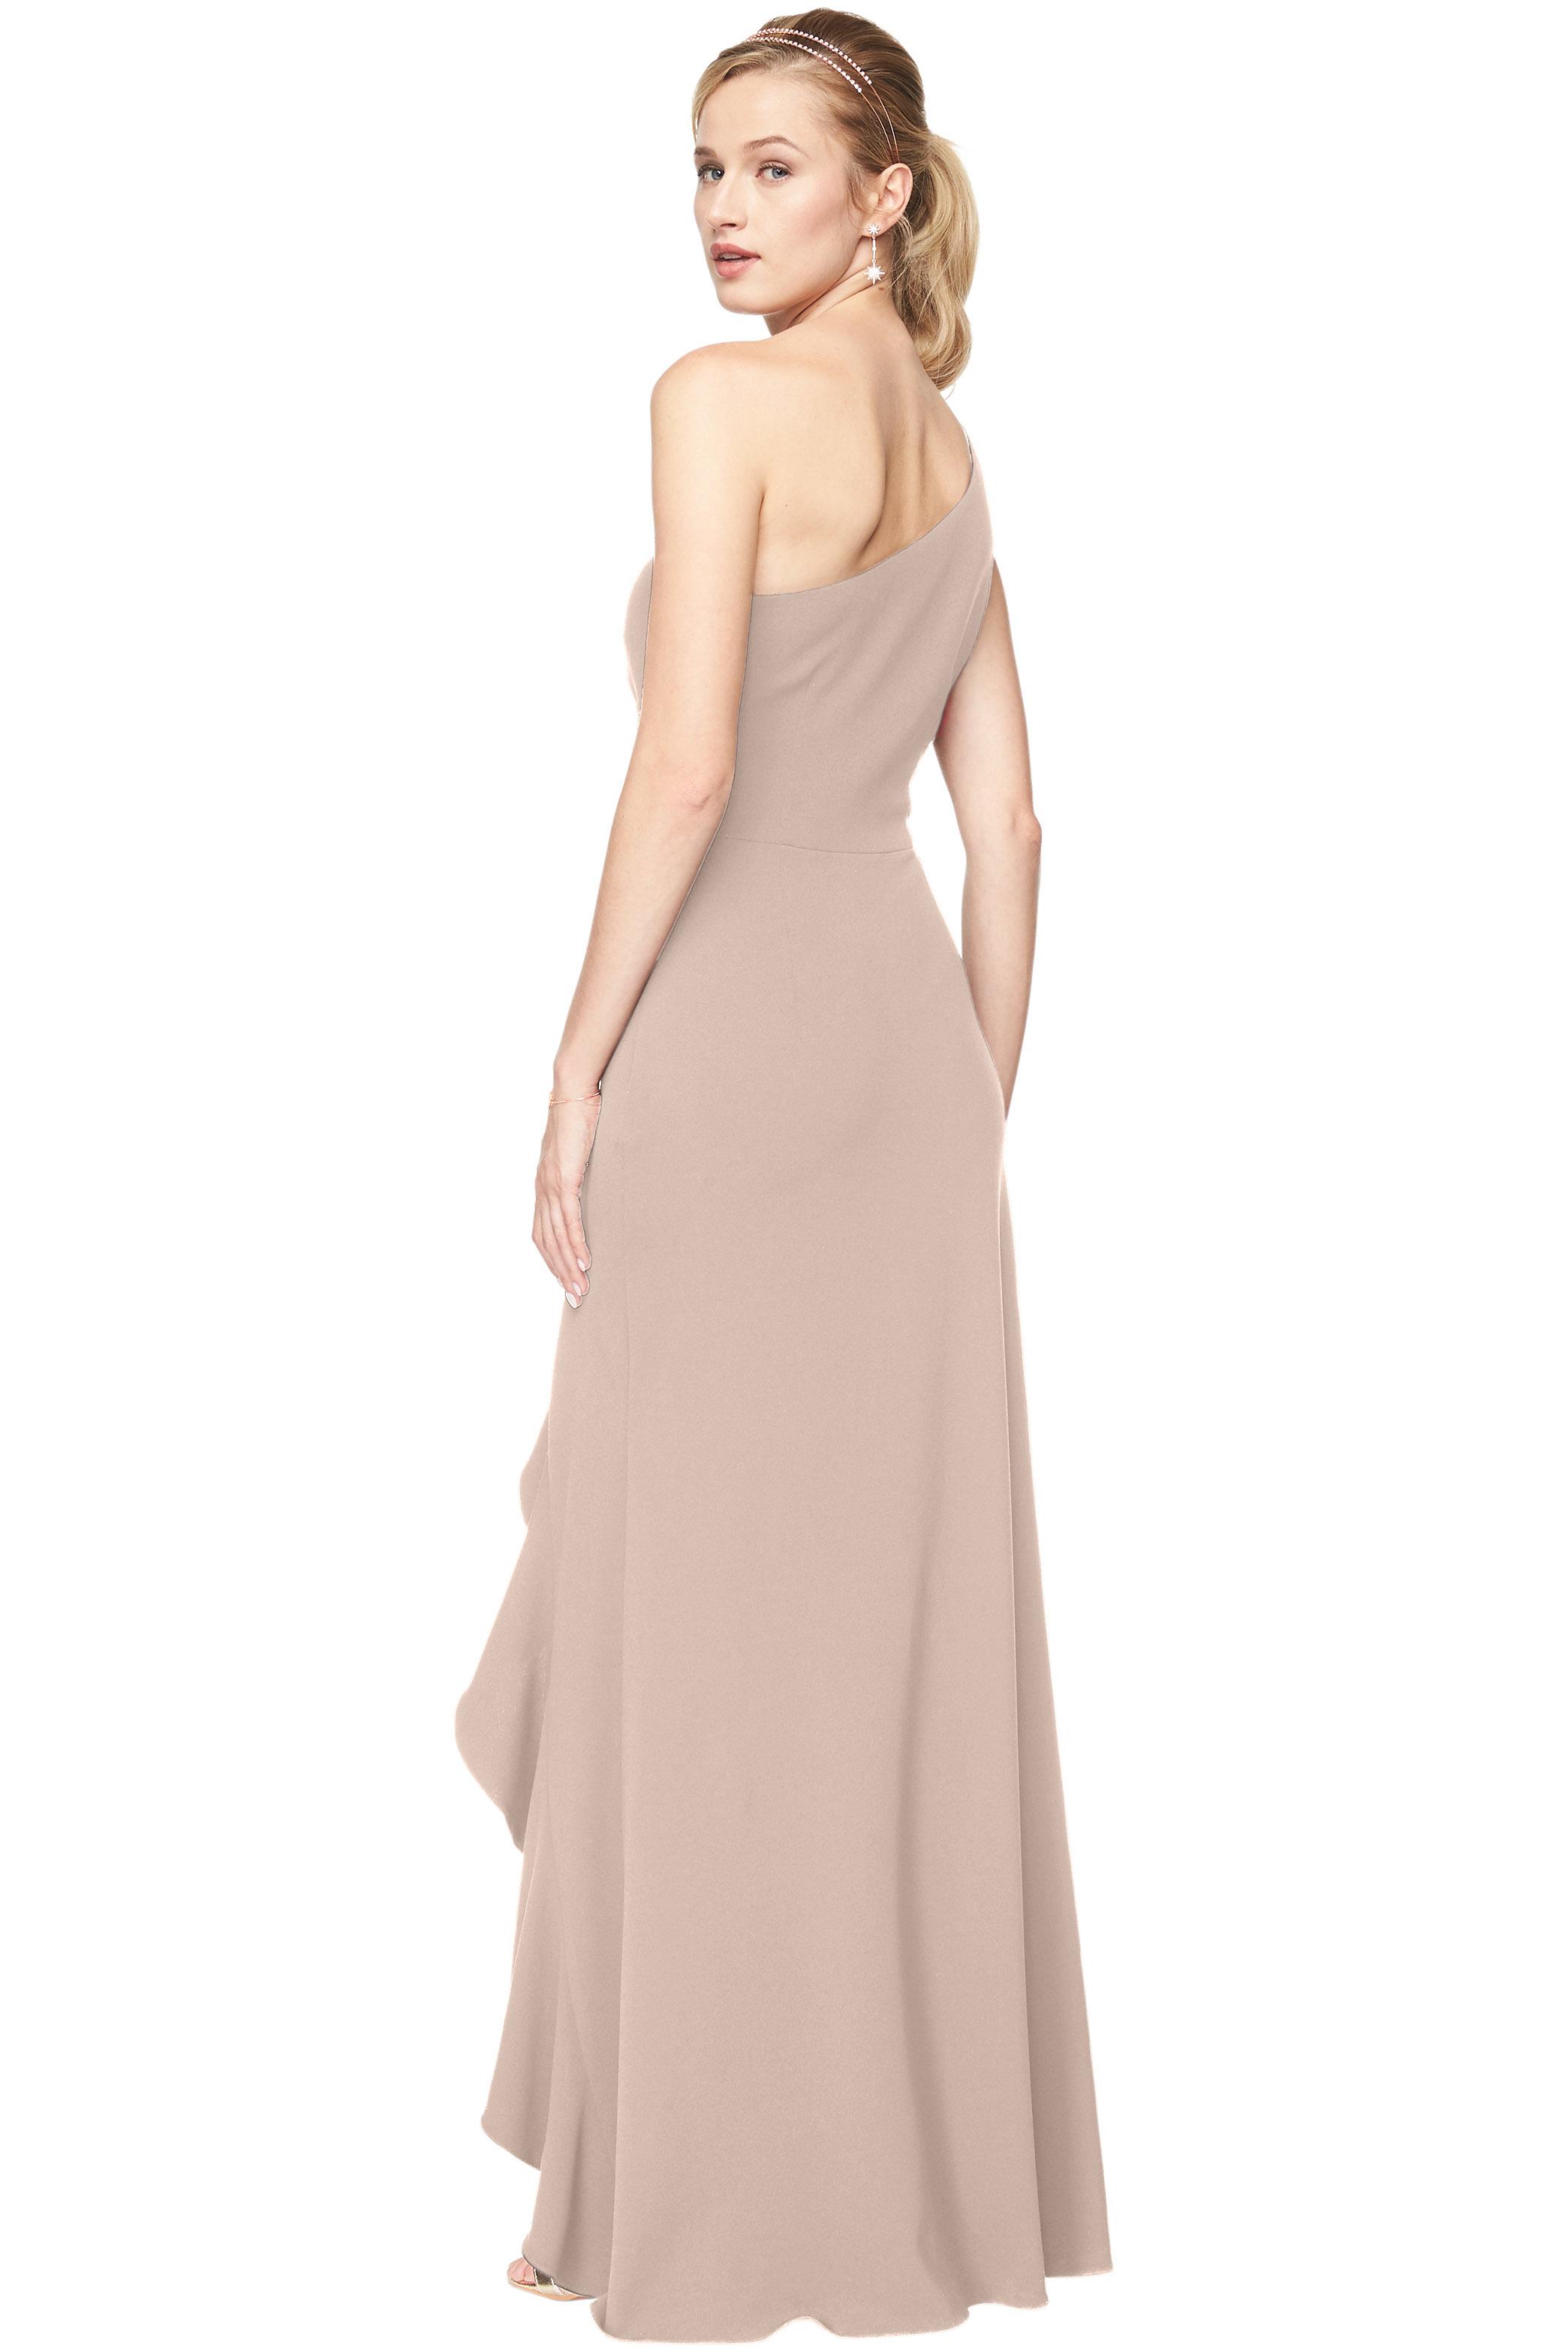 Bill Levkoff NUDE Stretch Crepe One-Shoulder A-Line gown, $240.00 Back